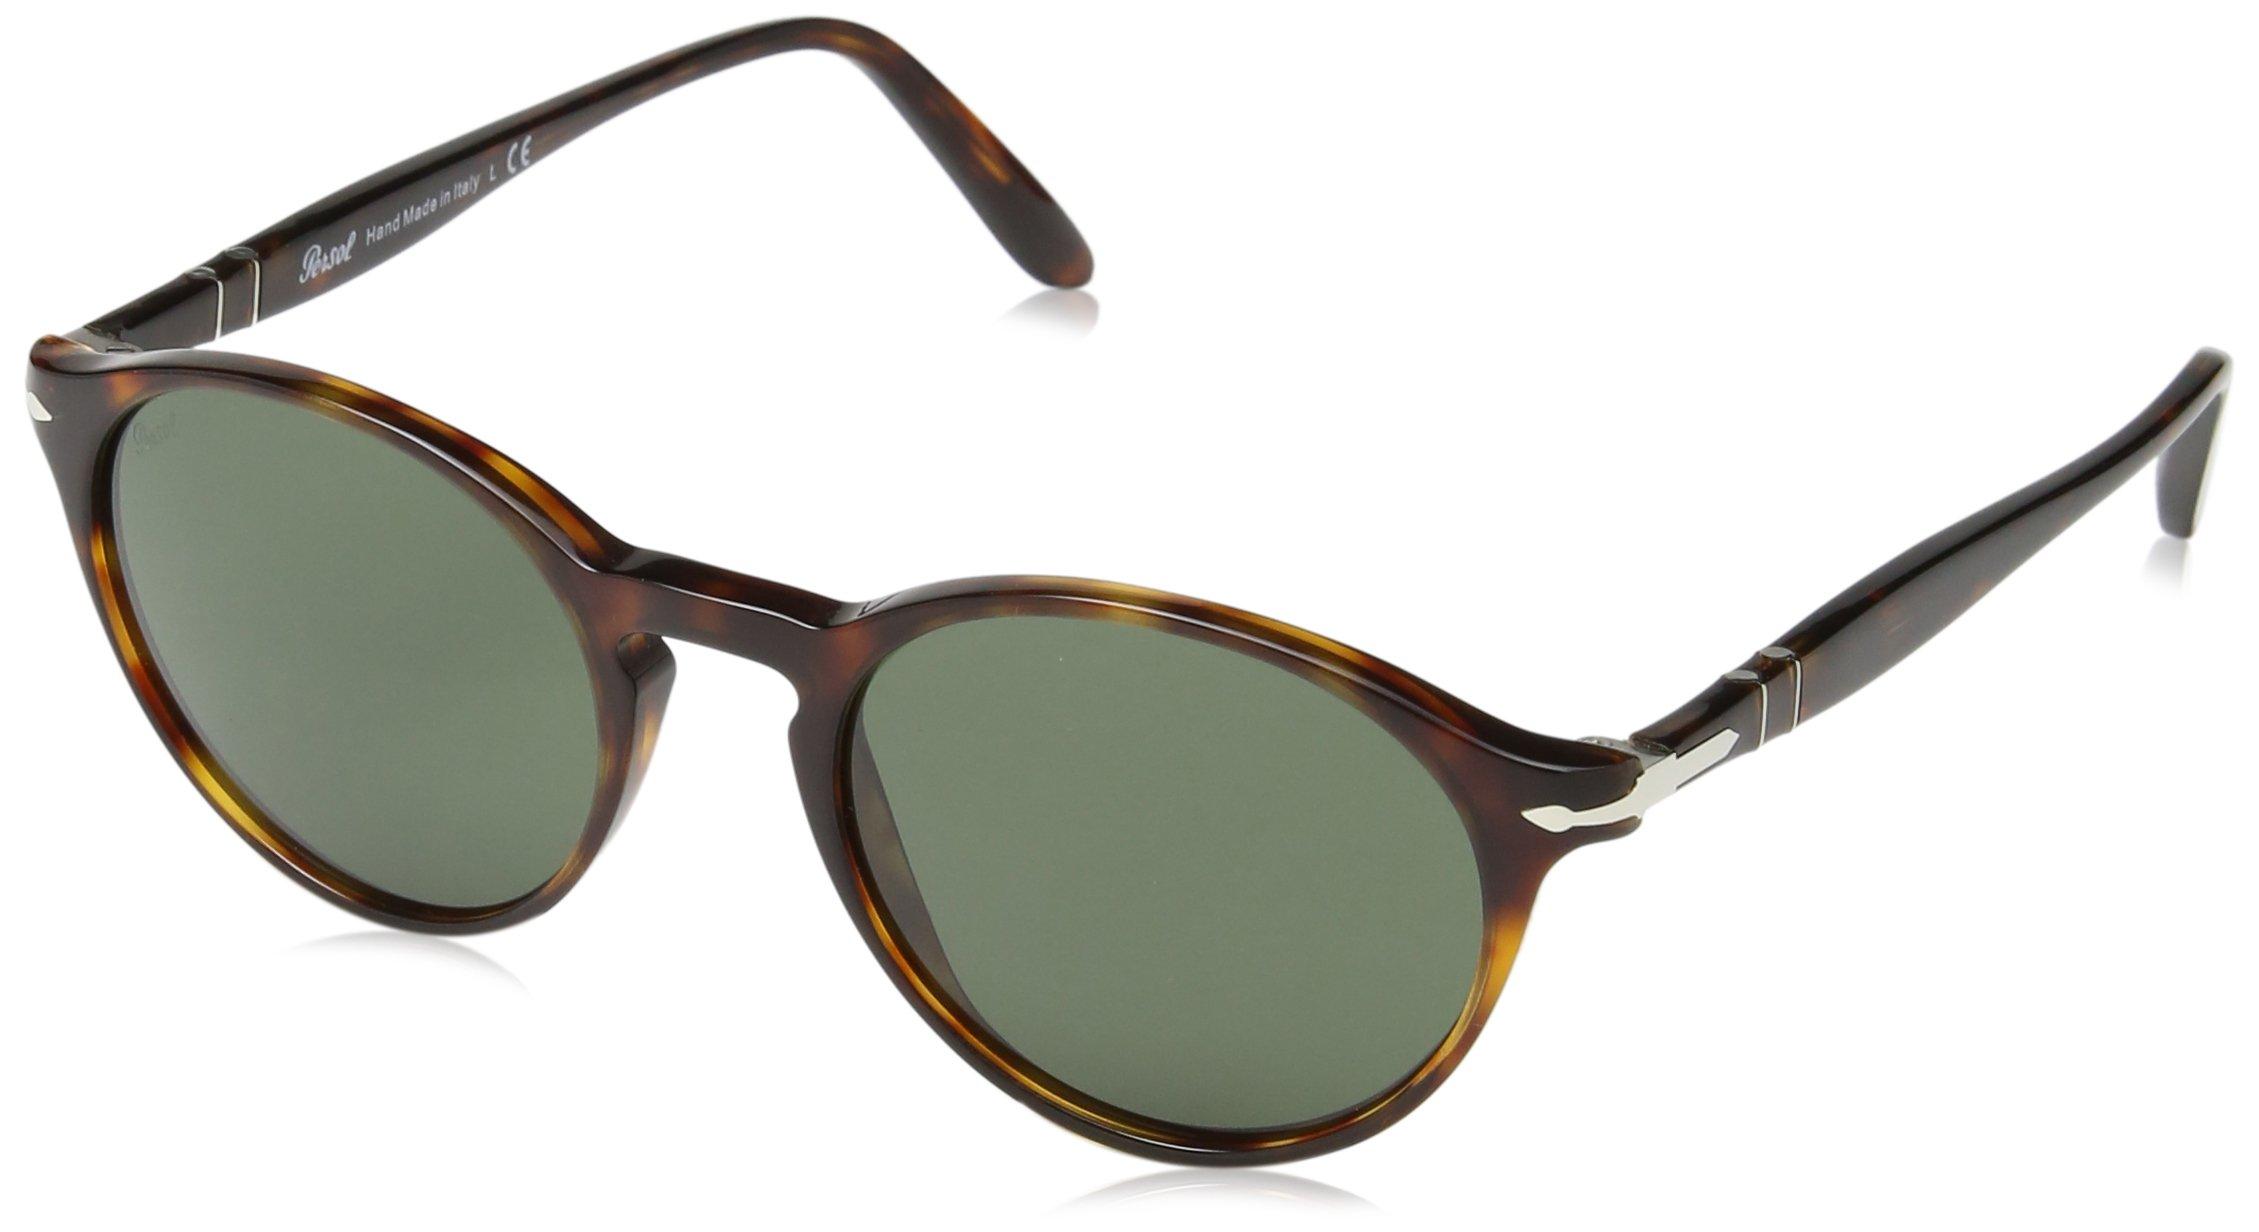 Persol Mens Sunglasses Tortoise/Green Acetate - Non-Polarized - 50mm